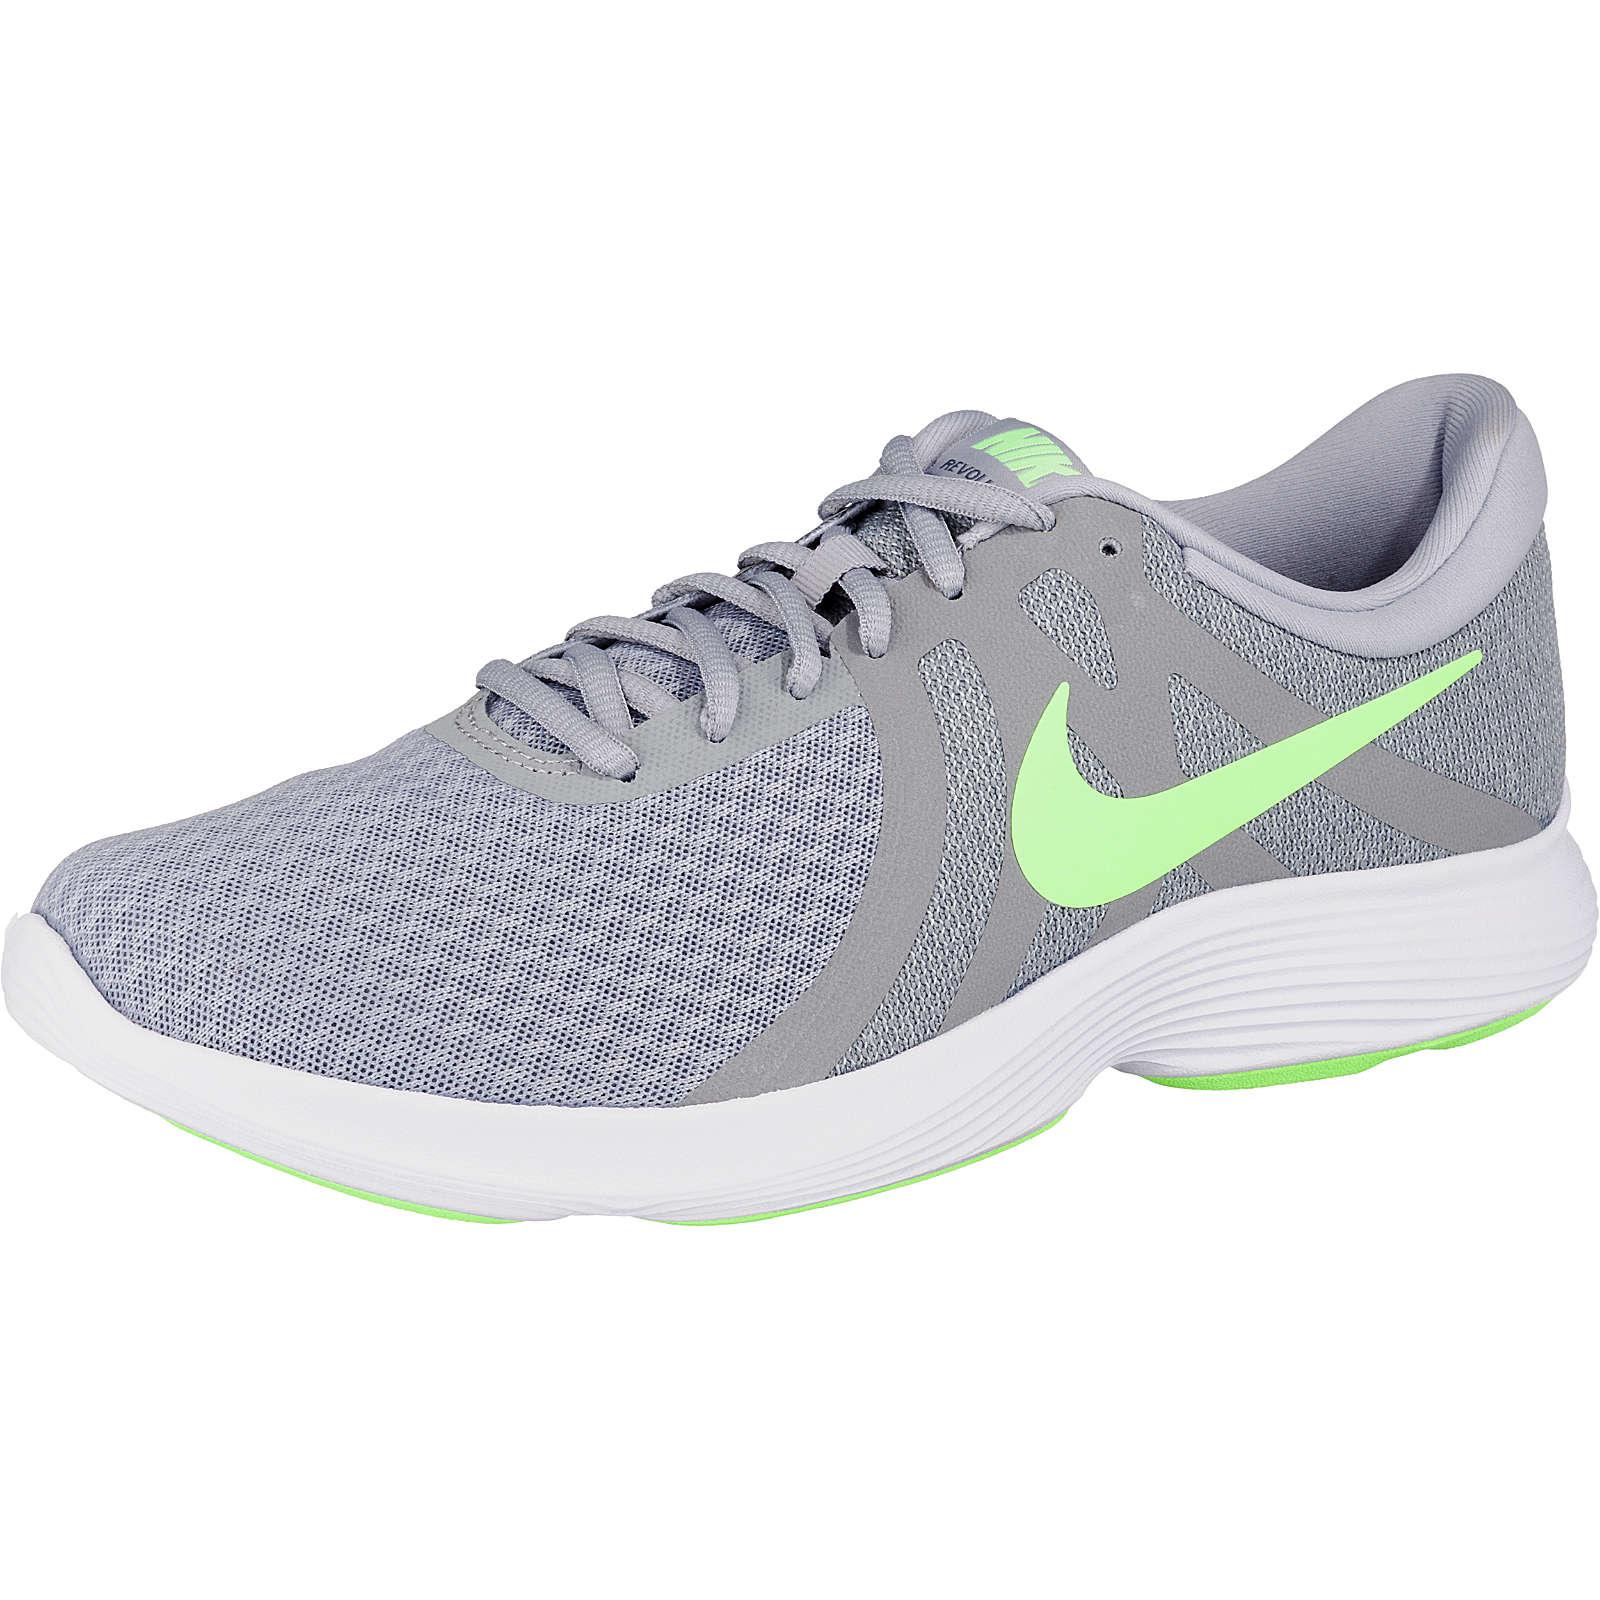 Nike Performance Revolution 4 Laufschuhe grau-kombi Herren Gr. 41